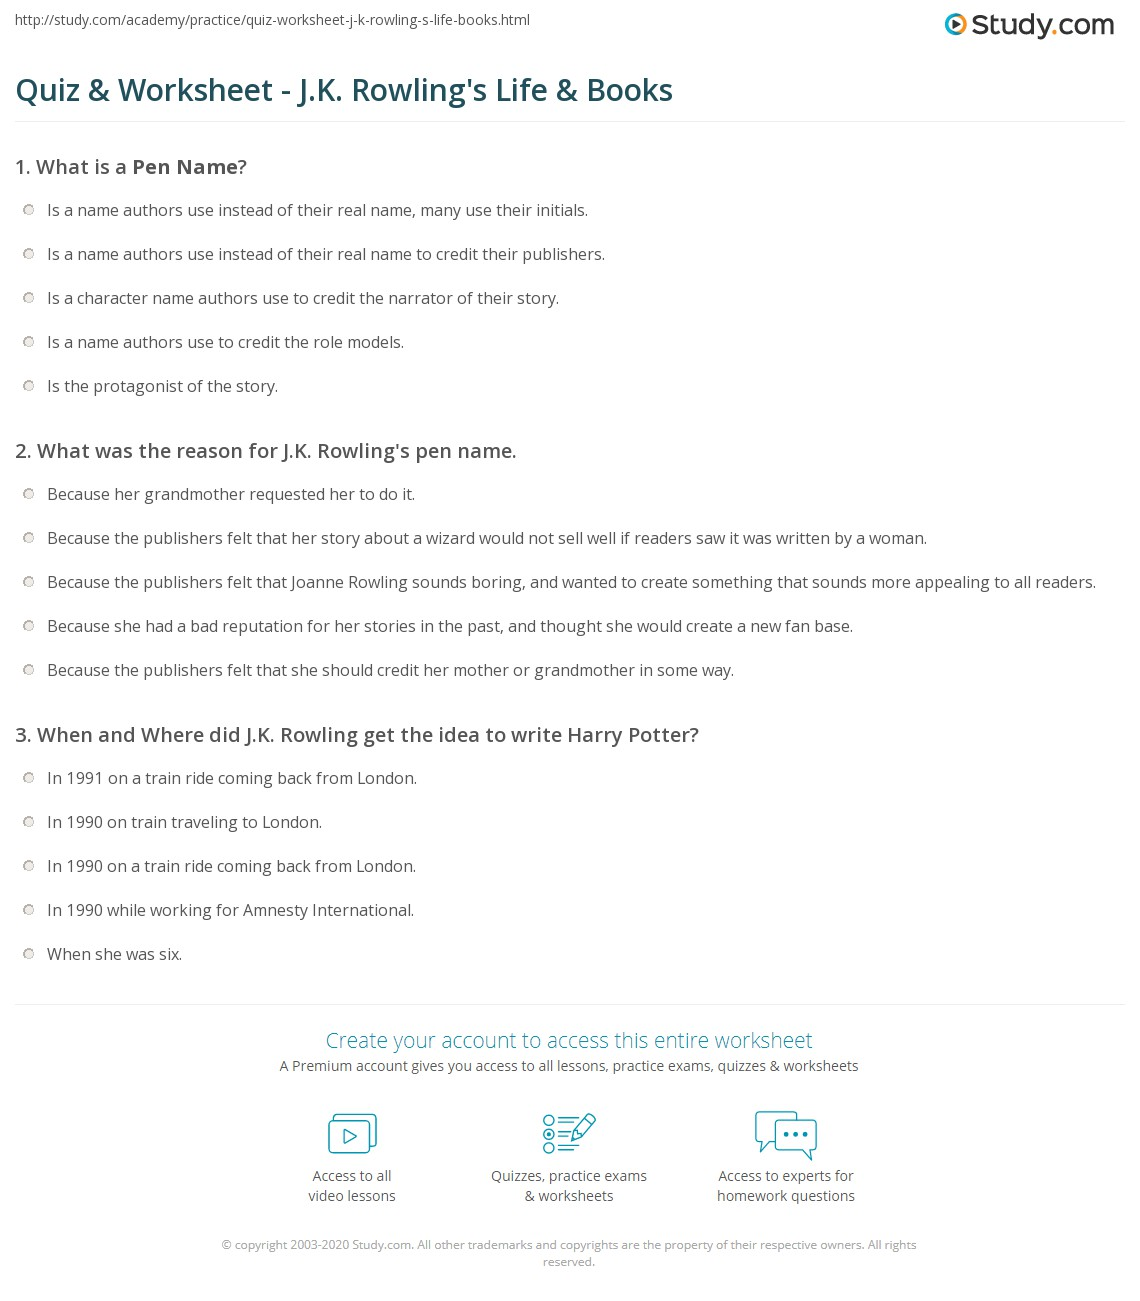 Cute Jk Worksheets Images - Worksheet Mathematics Ideas - dutapro.com